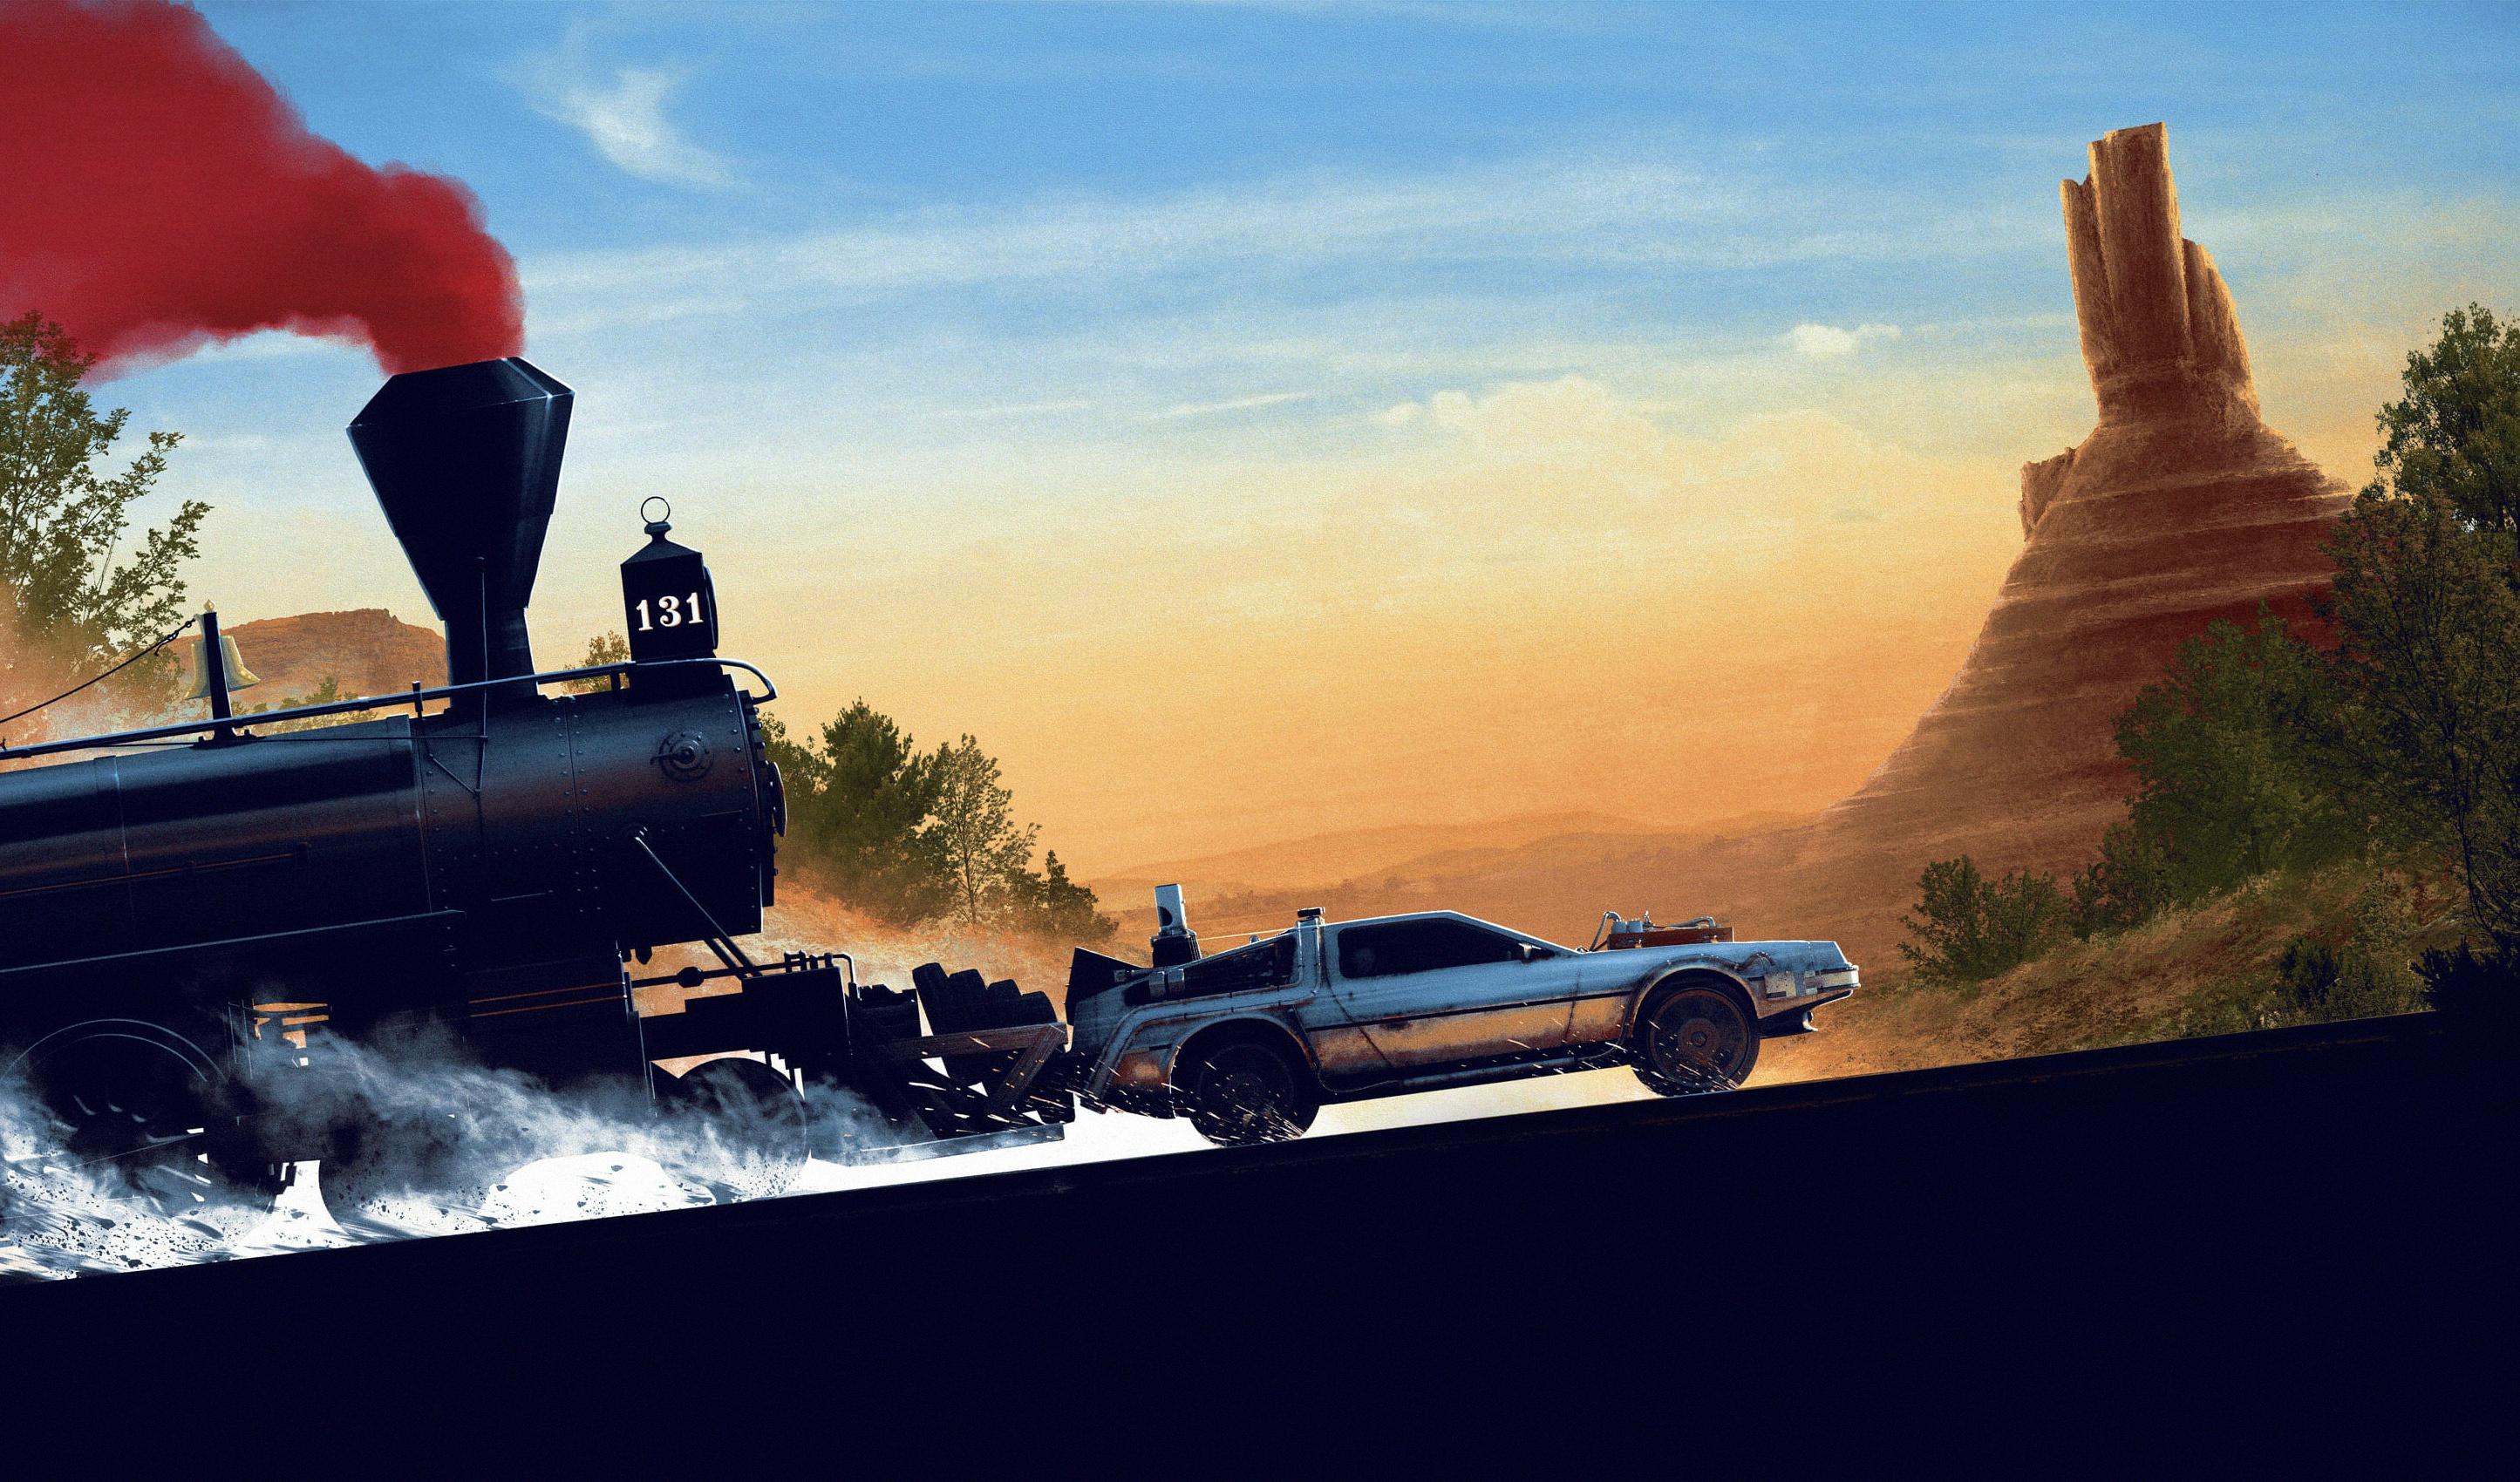 Wallpaper Train Time Machine Delorean Car Movies Back To